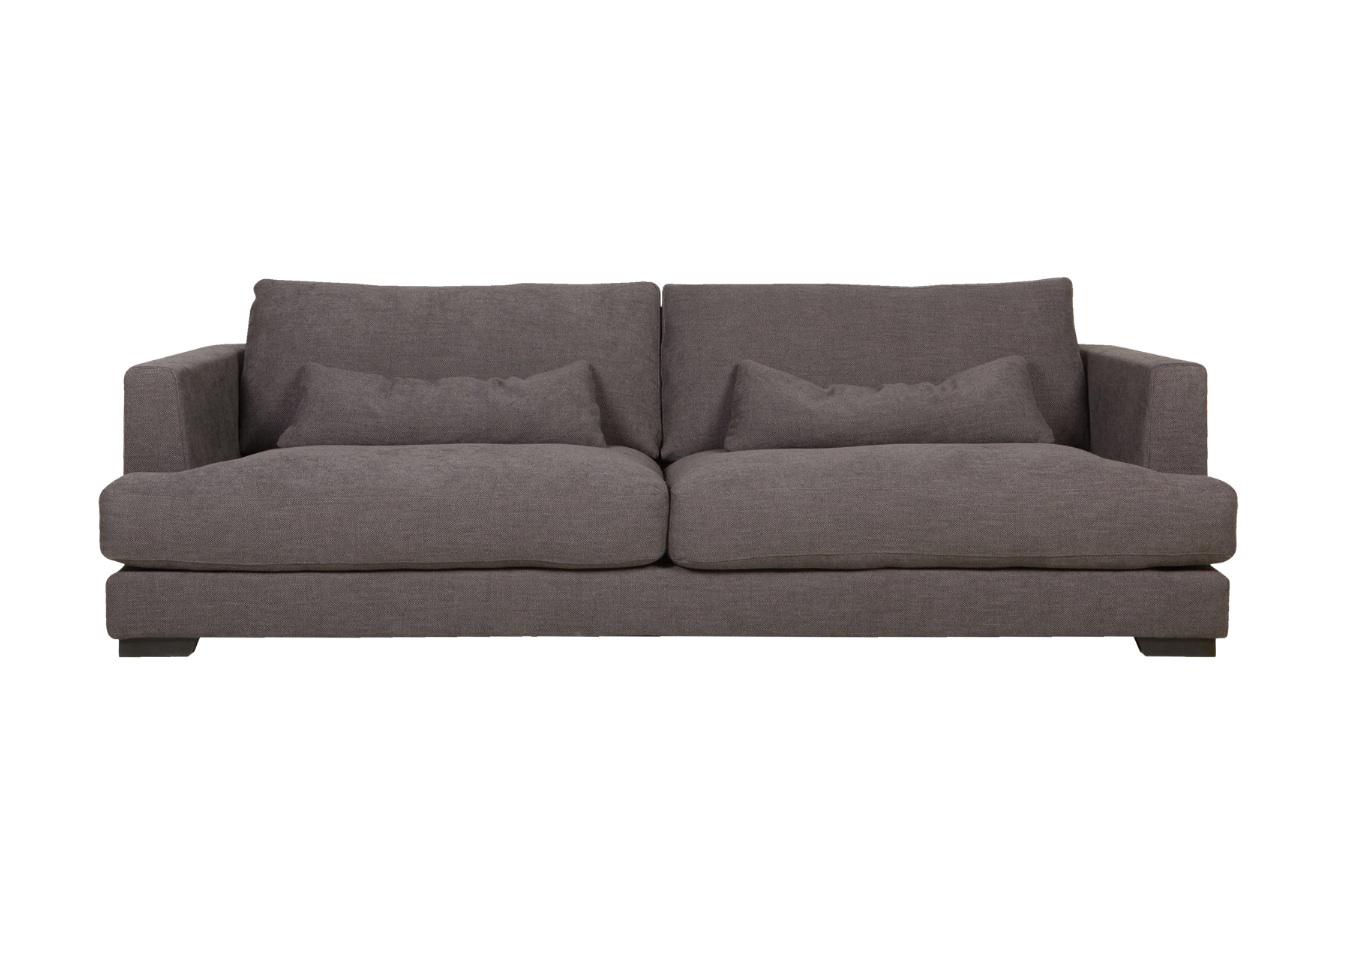 Conrad 3 Seater Sofa-30220